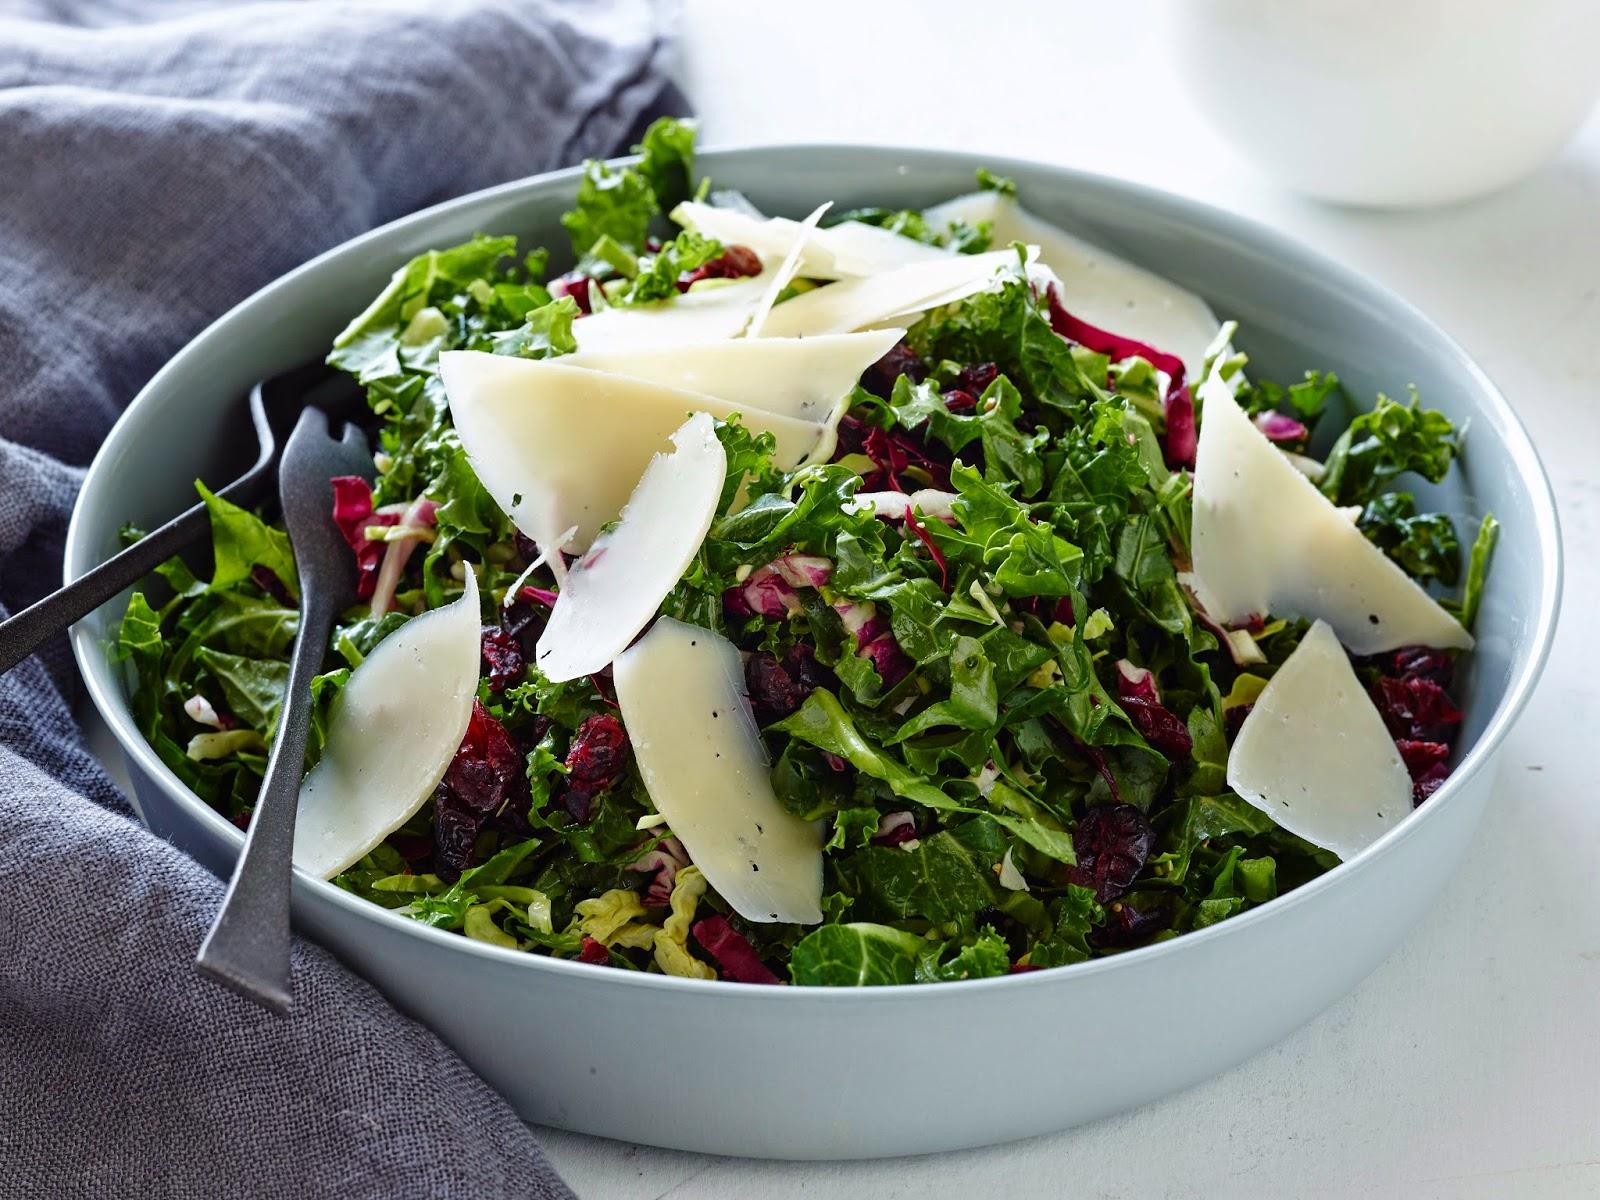 Ina Garten Salad Recipes ina garten barefoot contessa salad recipes - food salad recipes